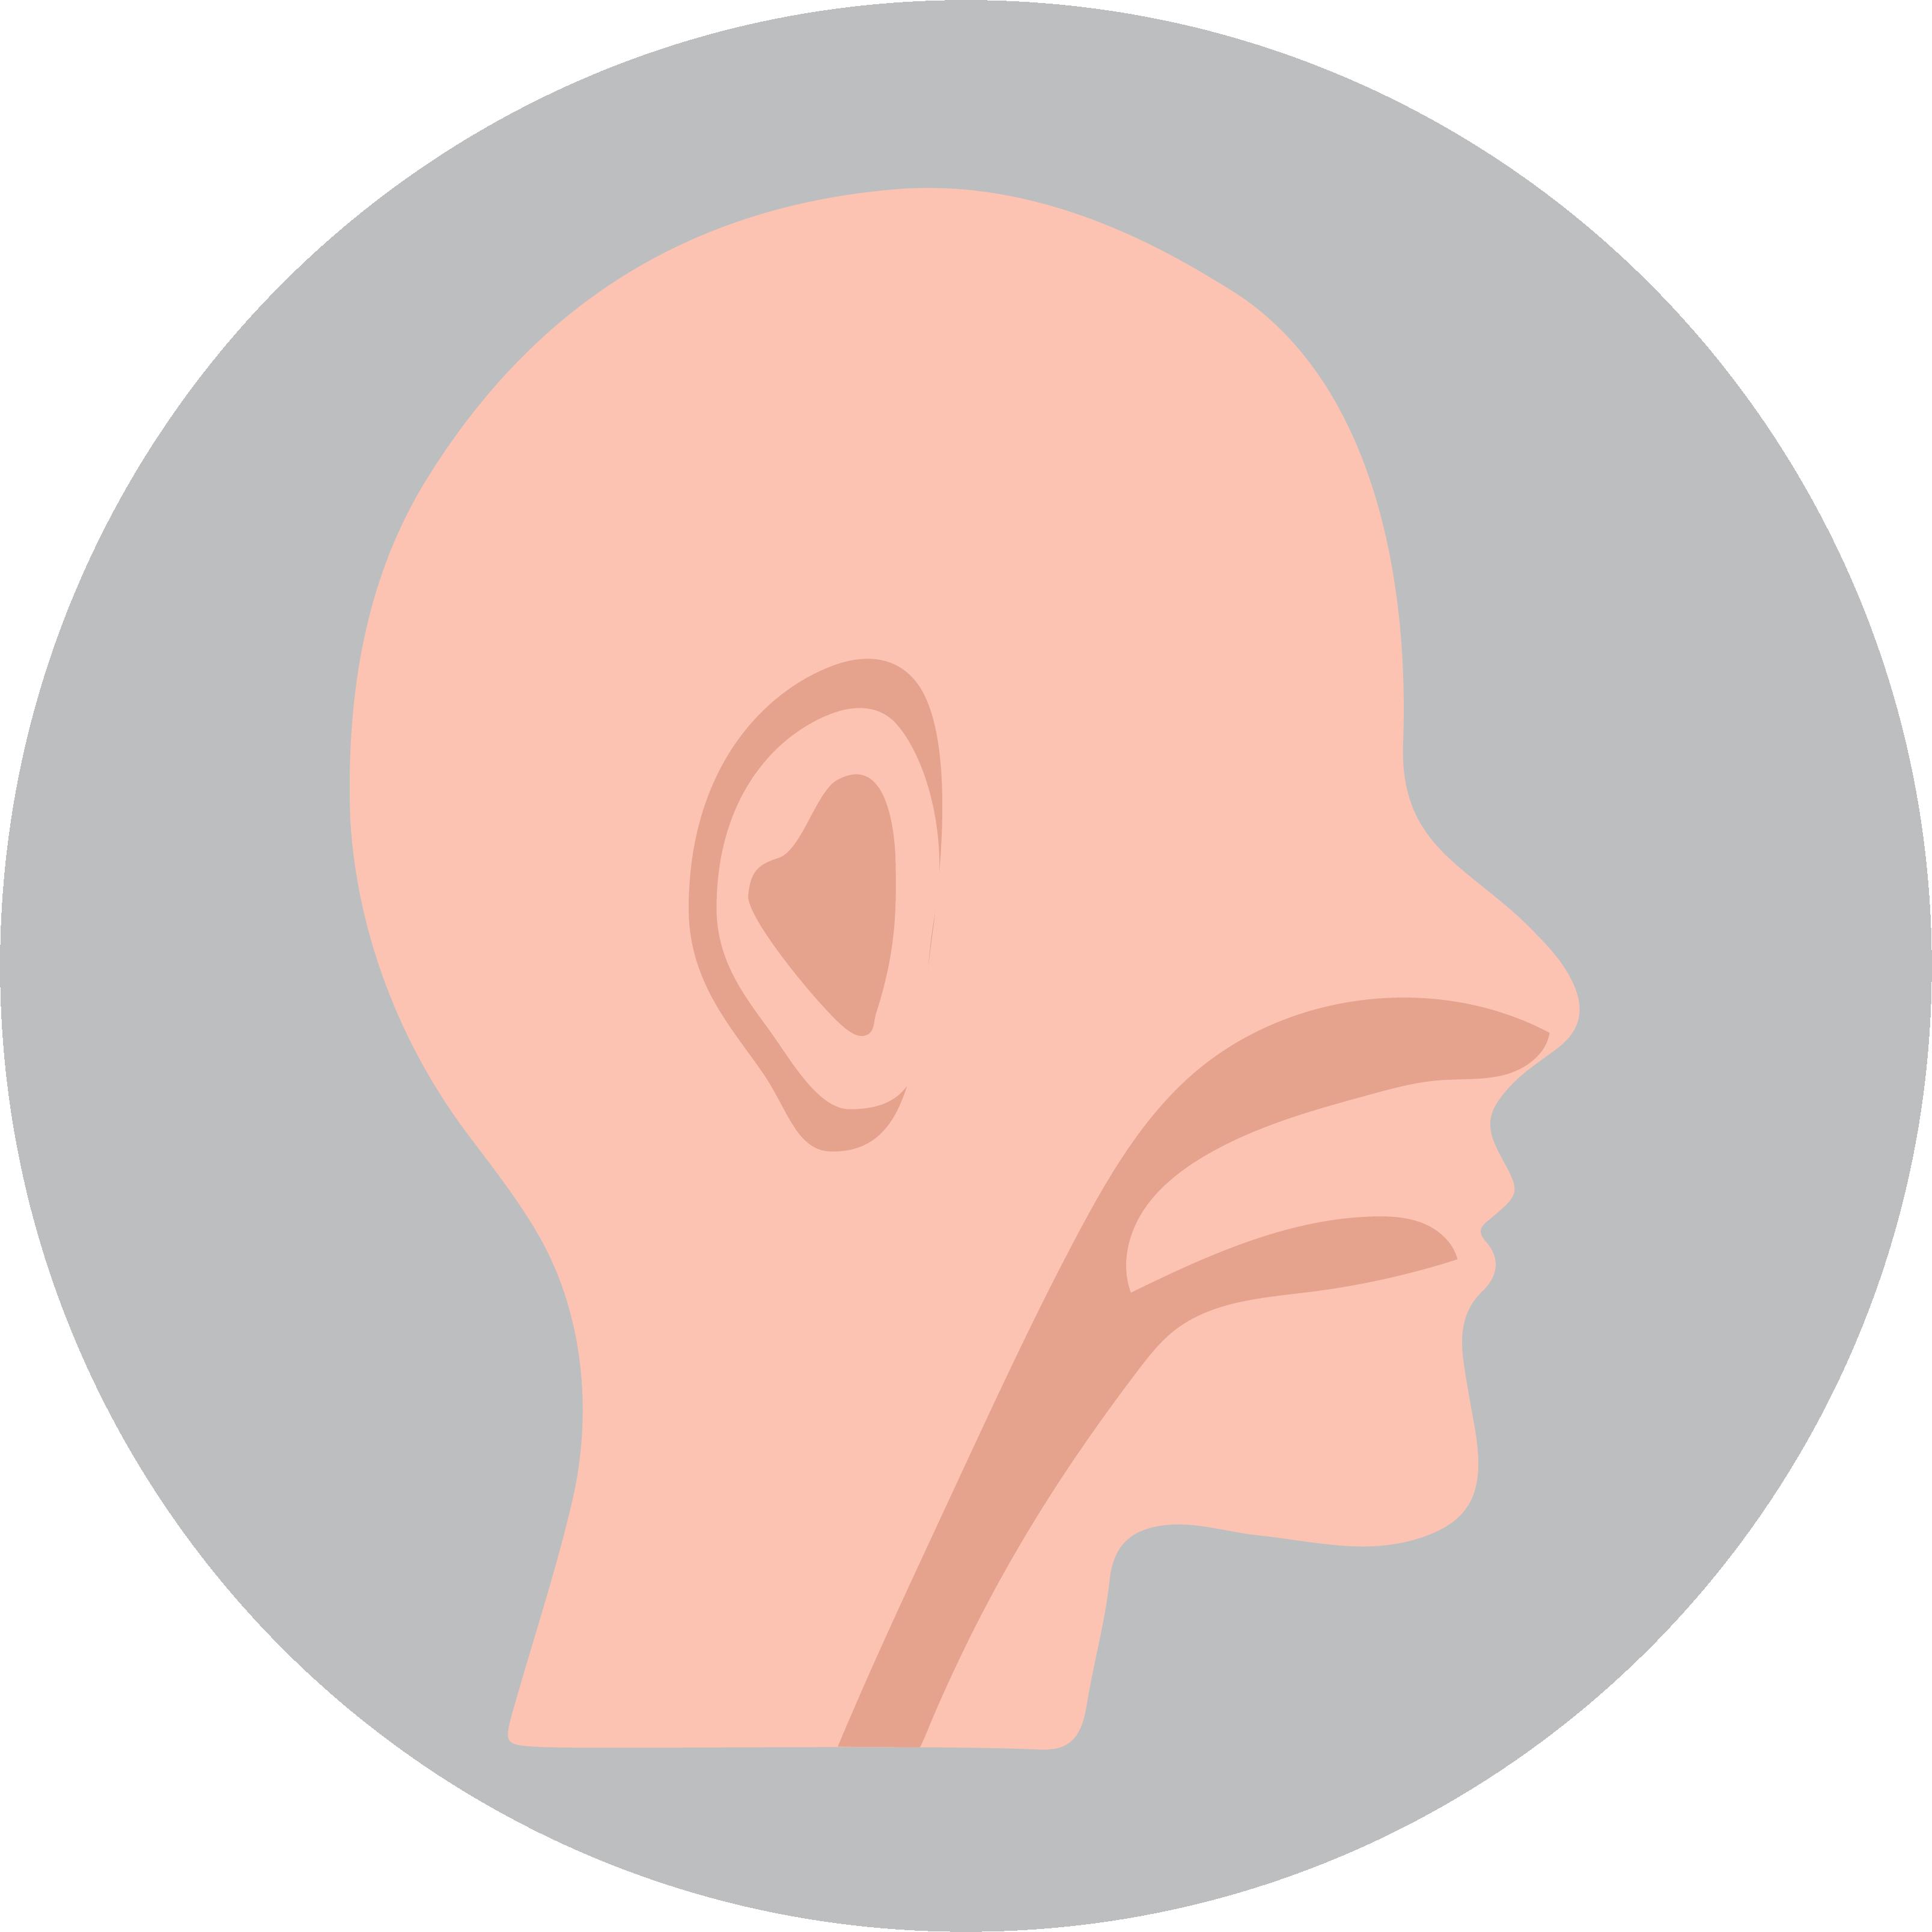 Ear, Nose, & Throat